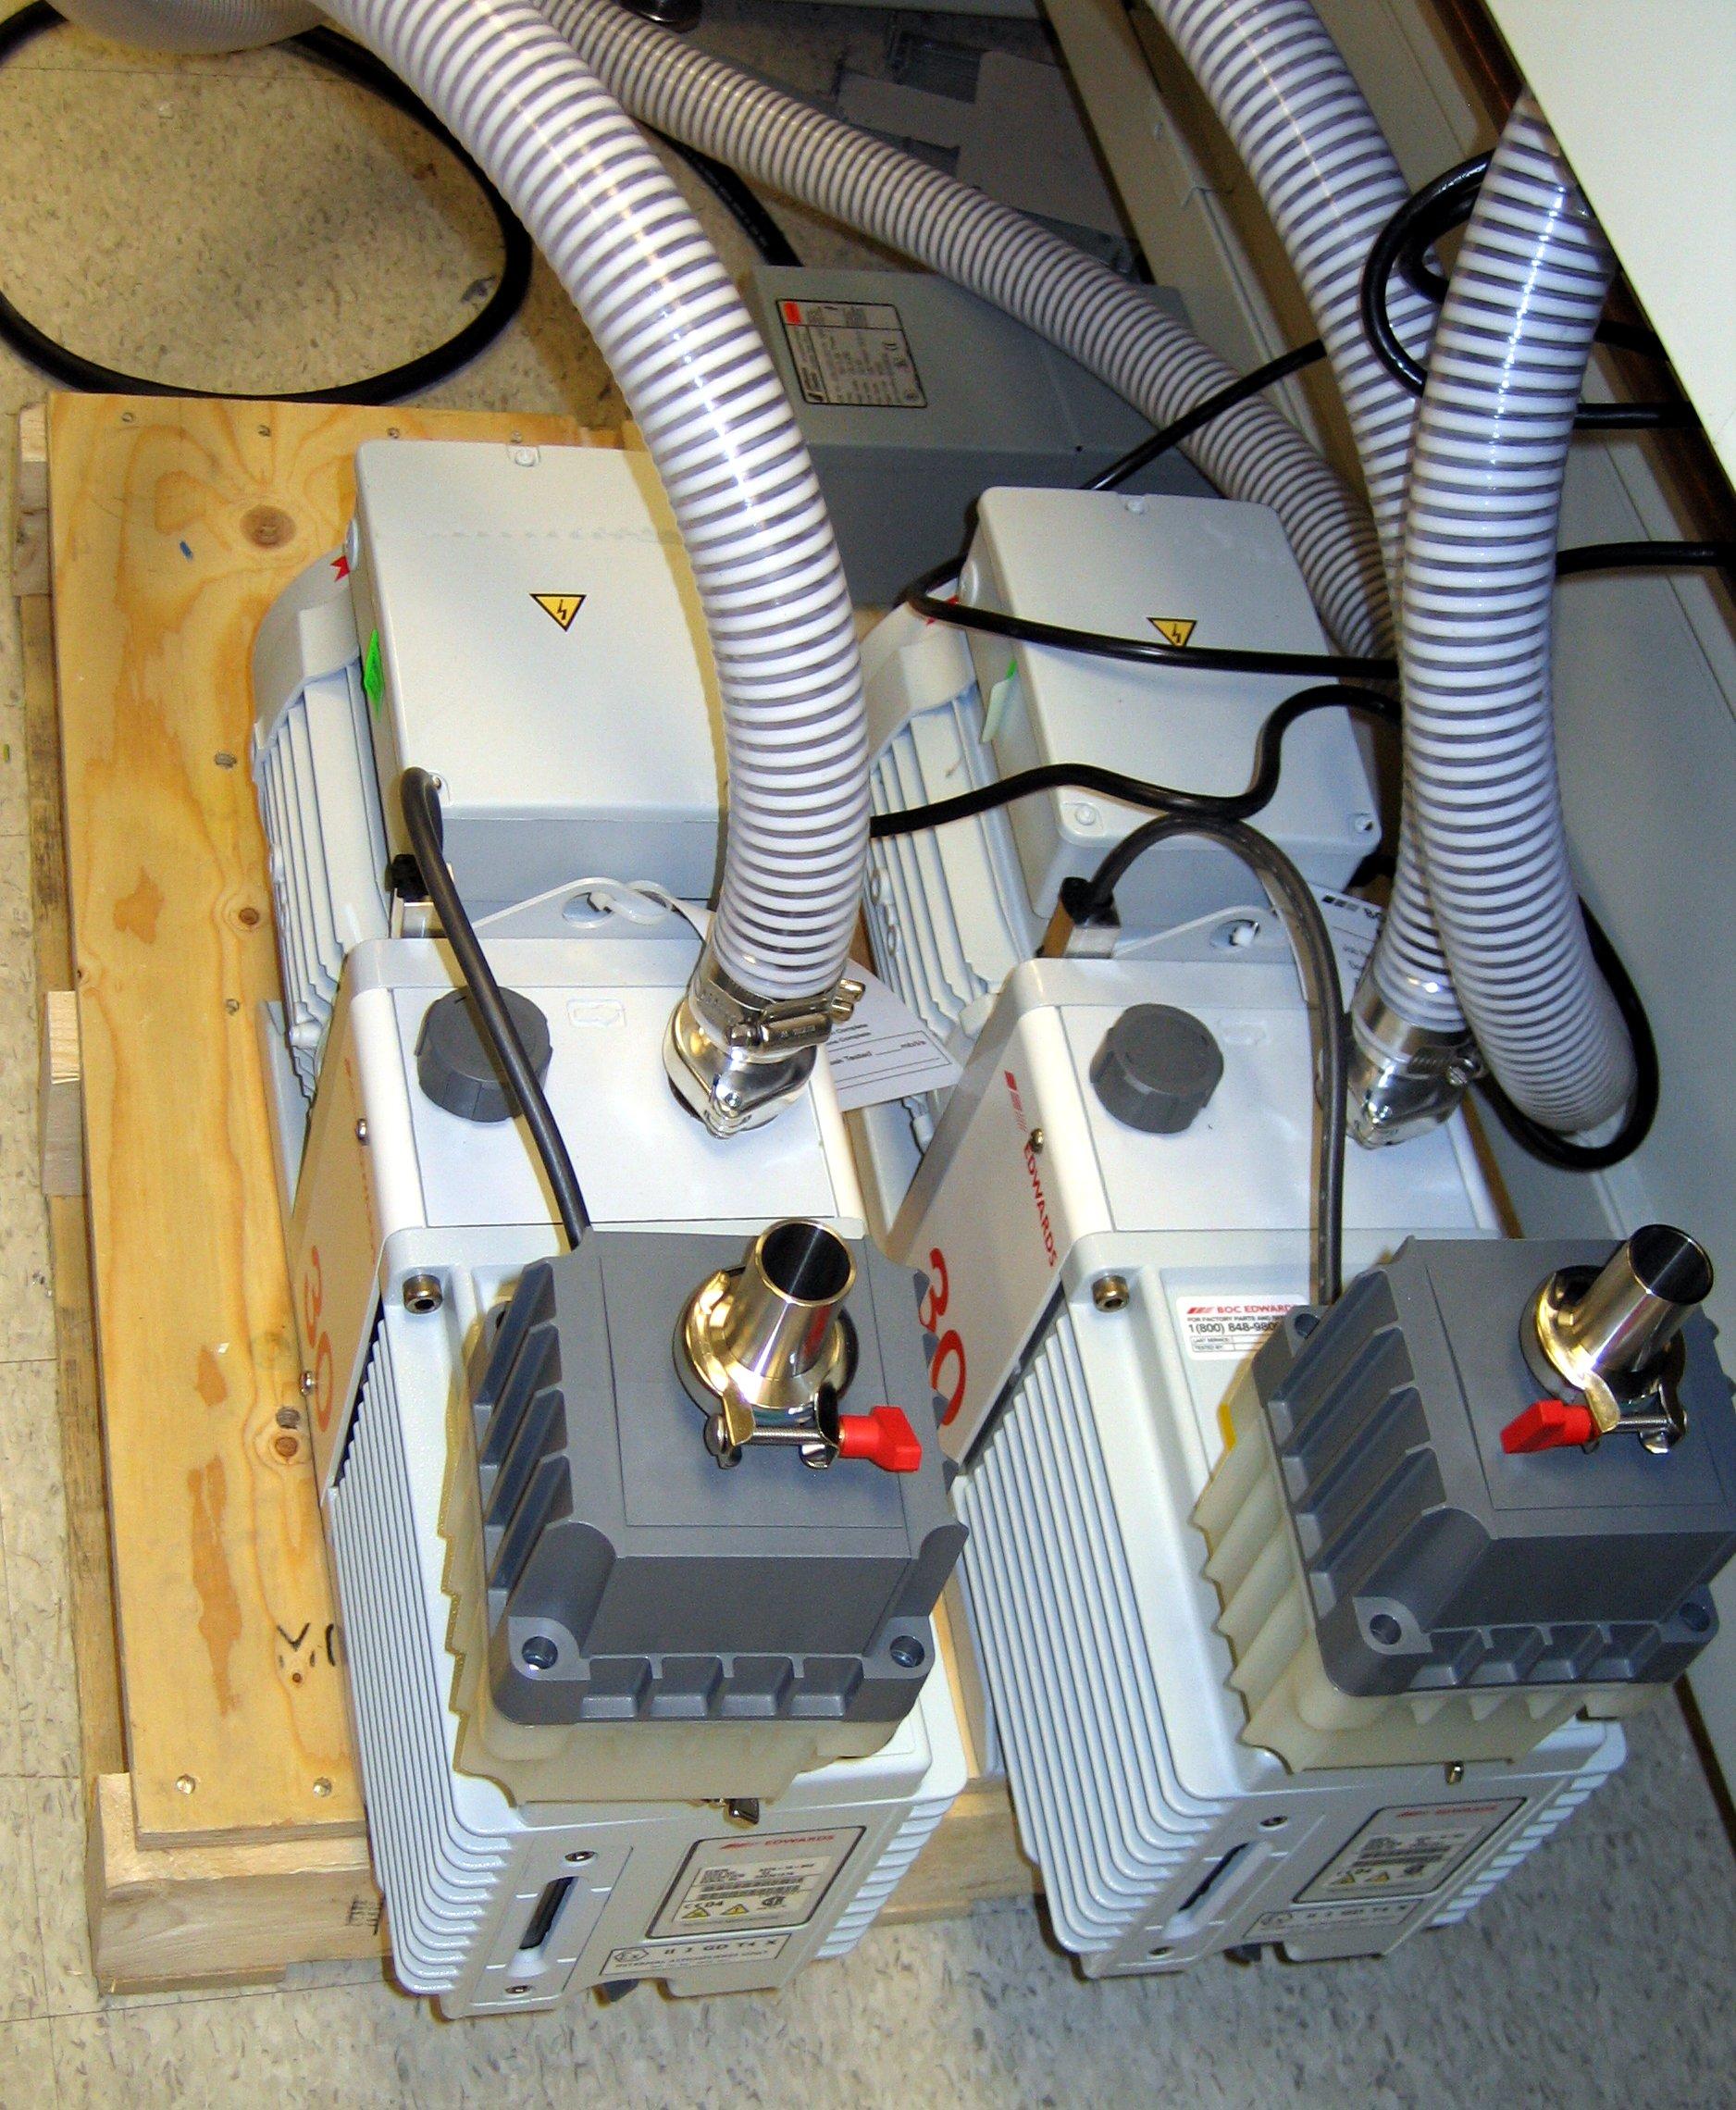 File:LTQ - Rough Pumps.jpg - Wikimedia Commons